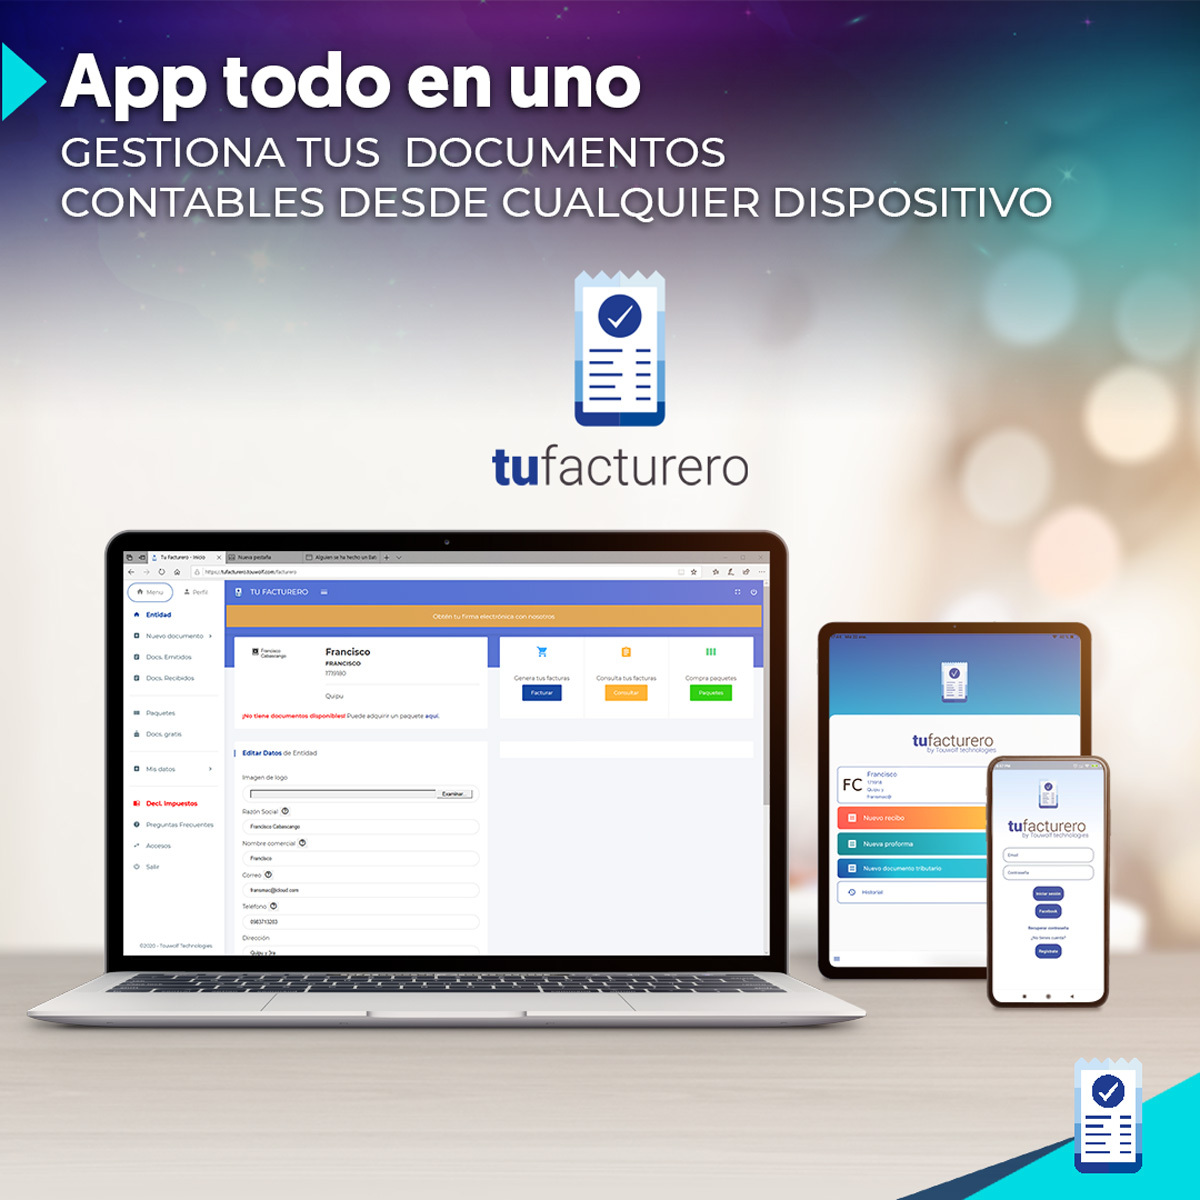 App multi-plataforma